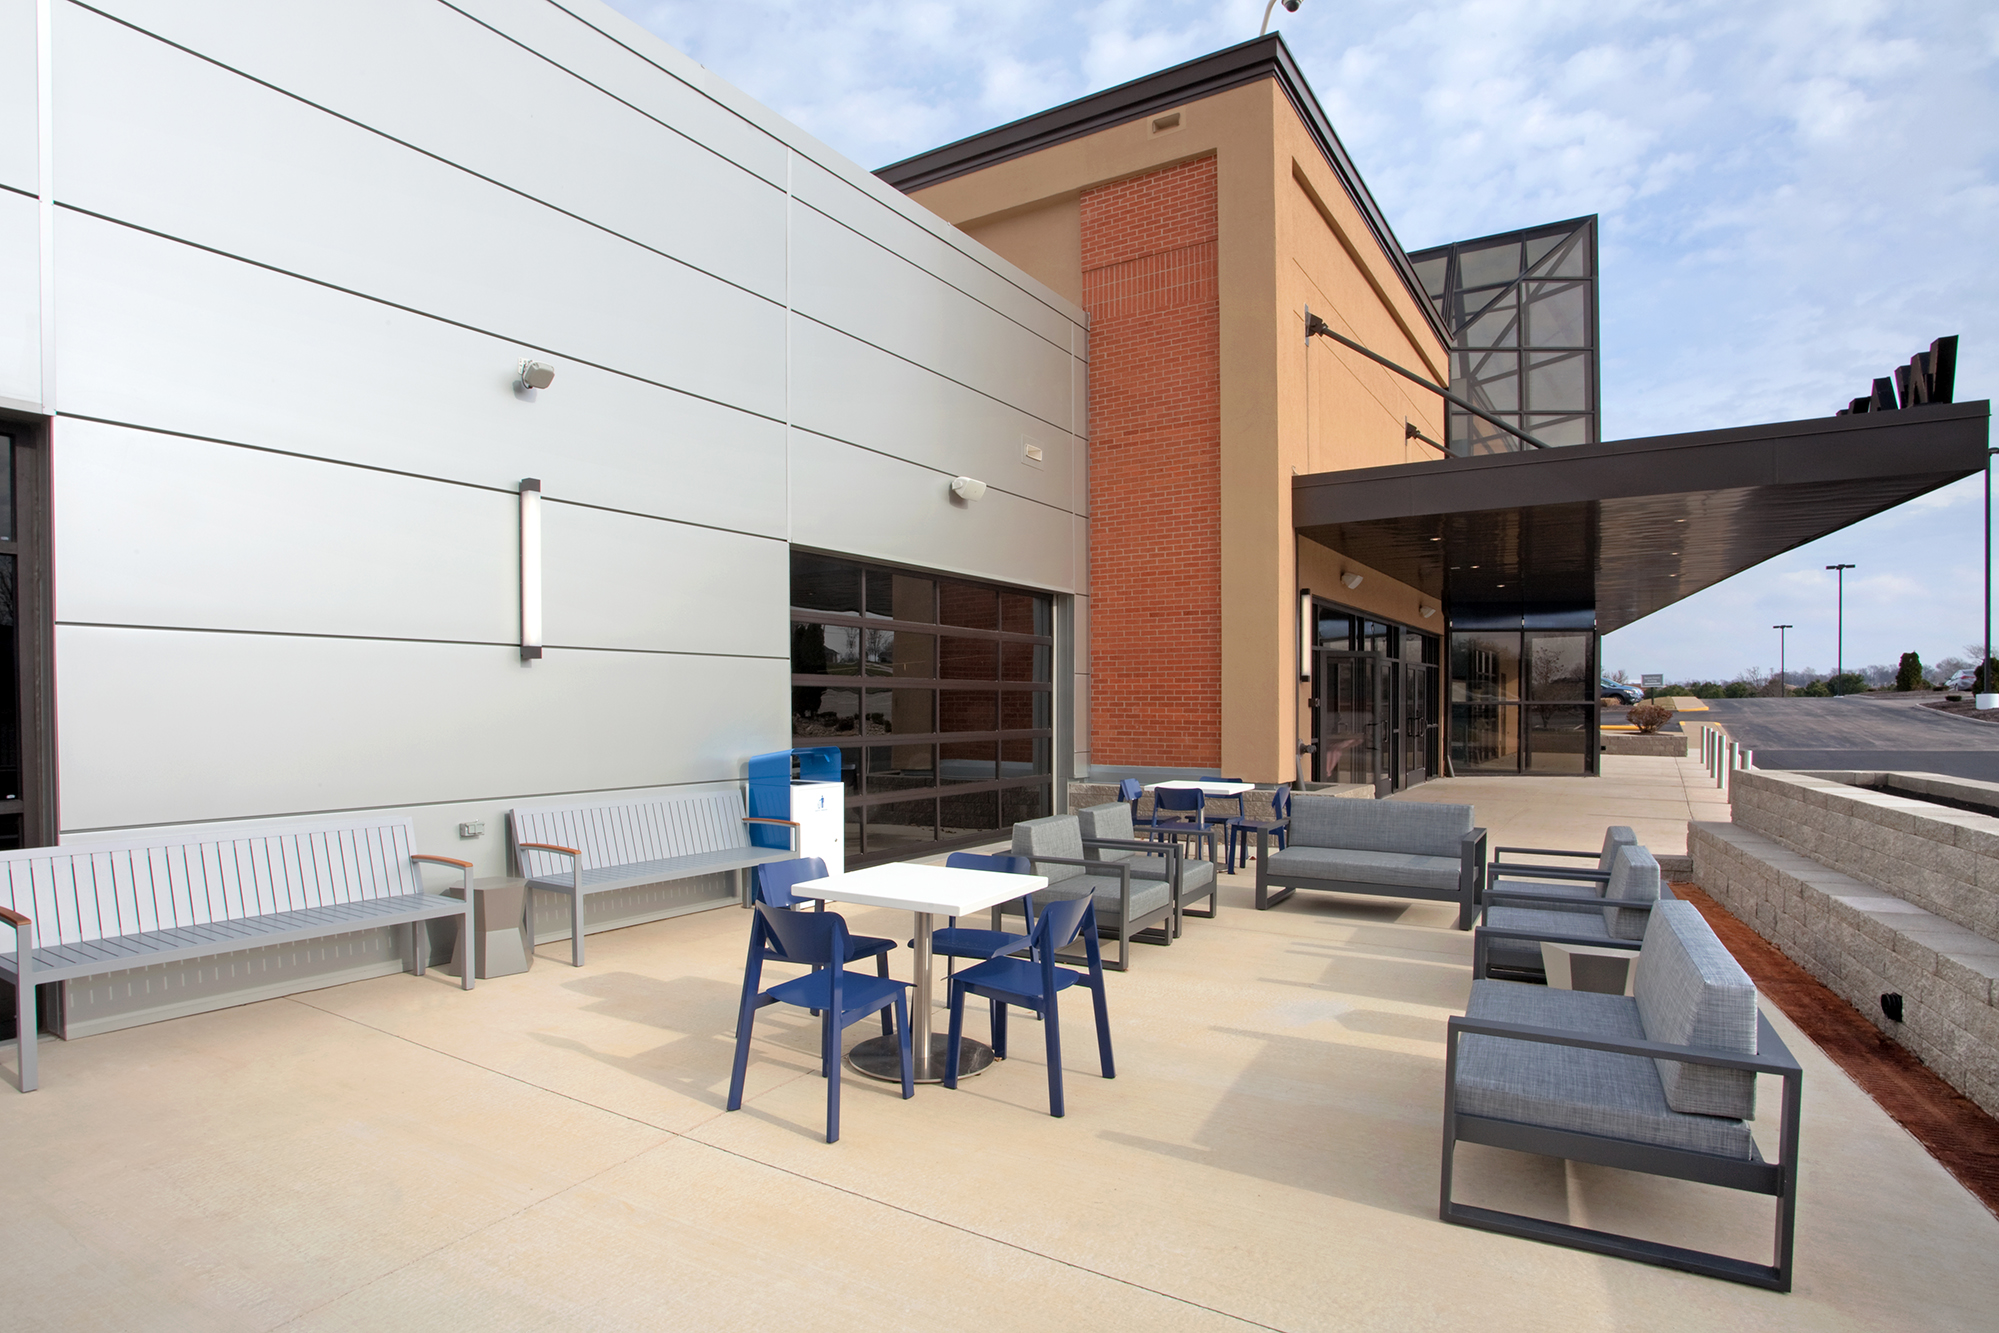 waypoint-exterior-patio